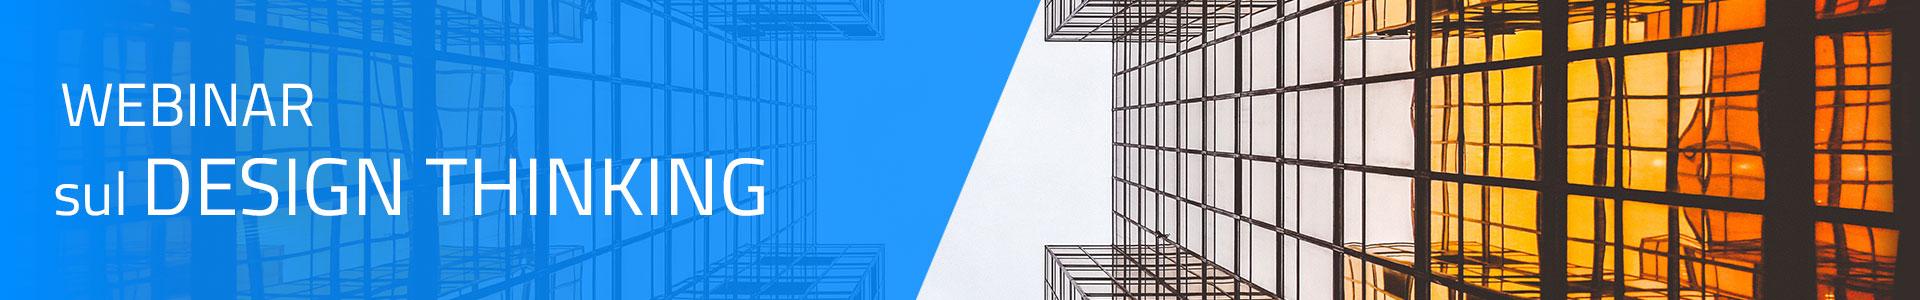 Webinar Design Thinking Consortium Service